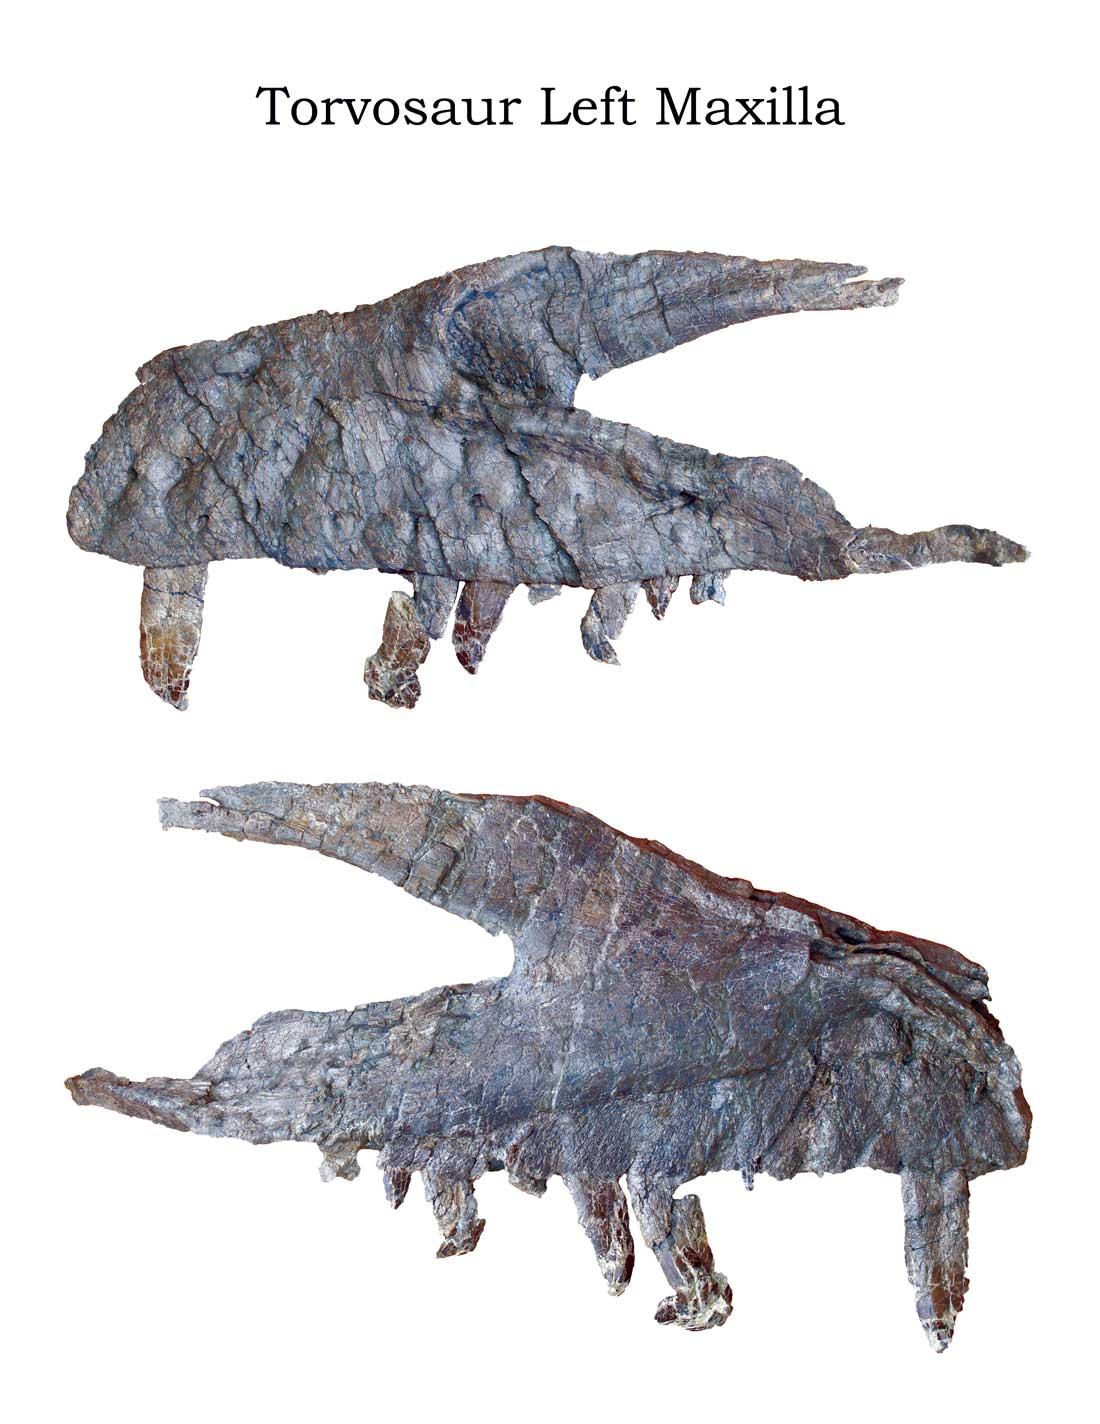 Torvosaur-Left-Maxilla